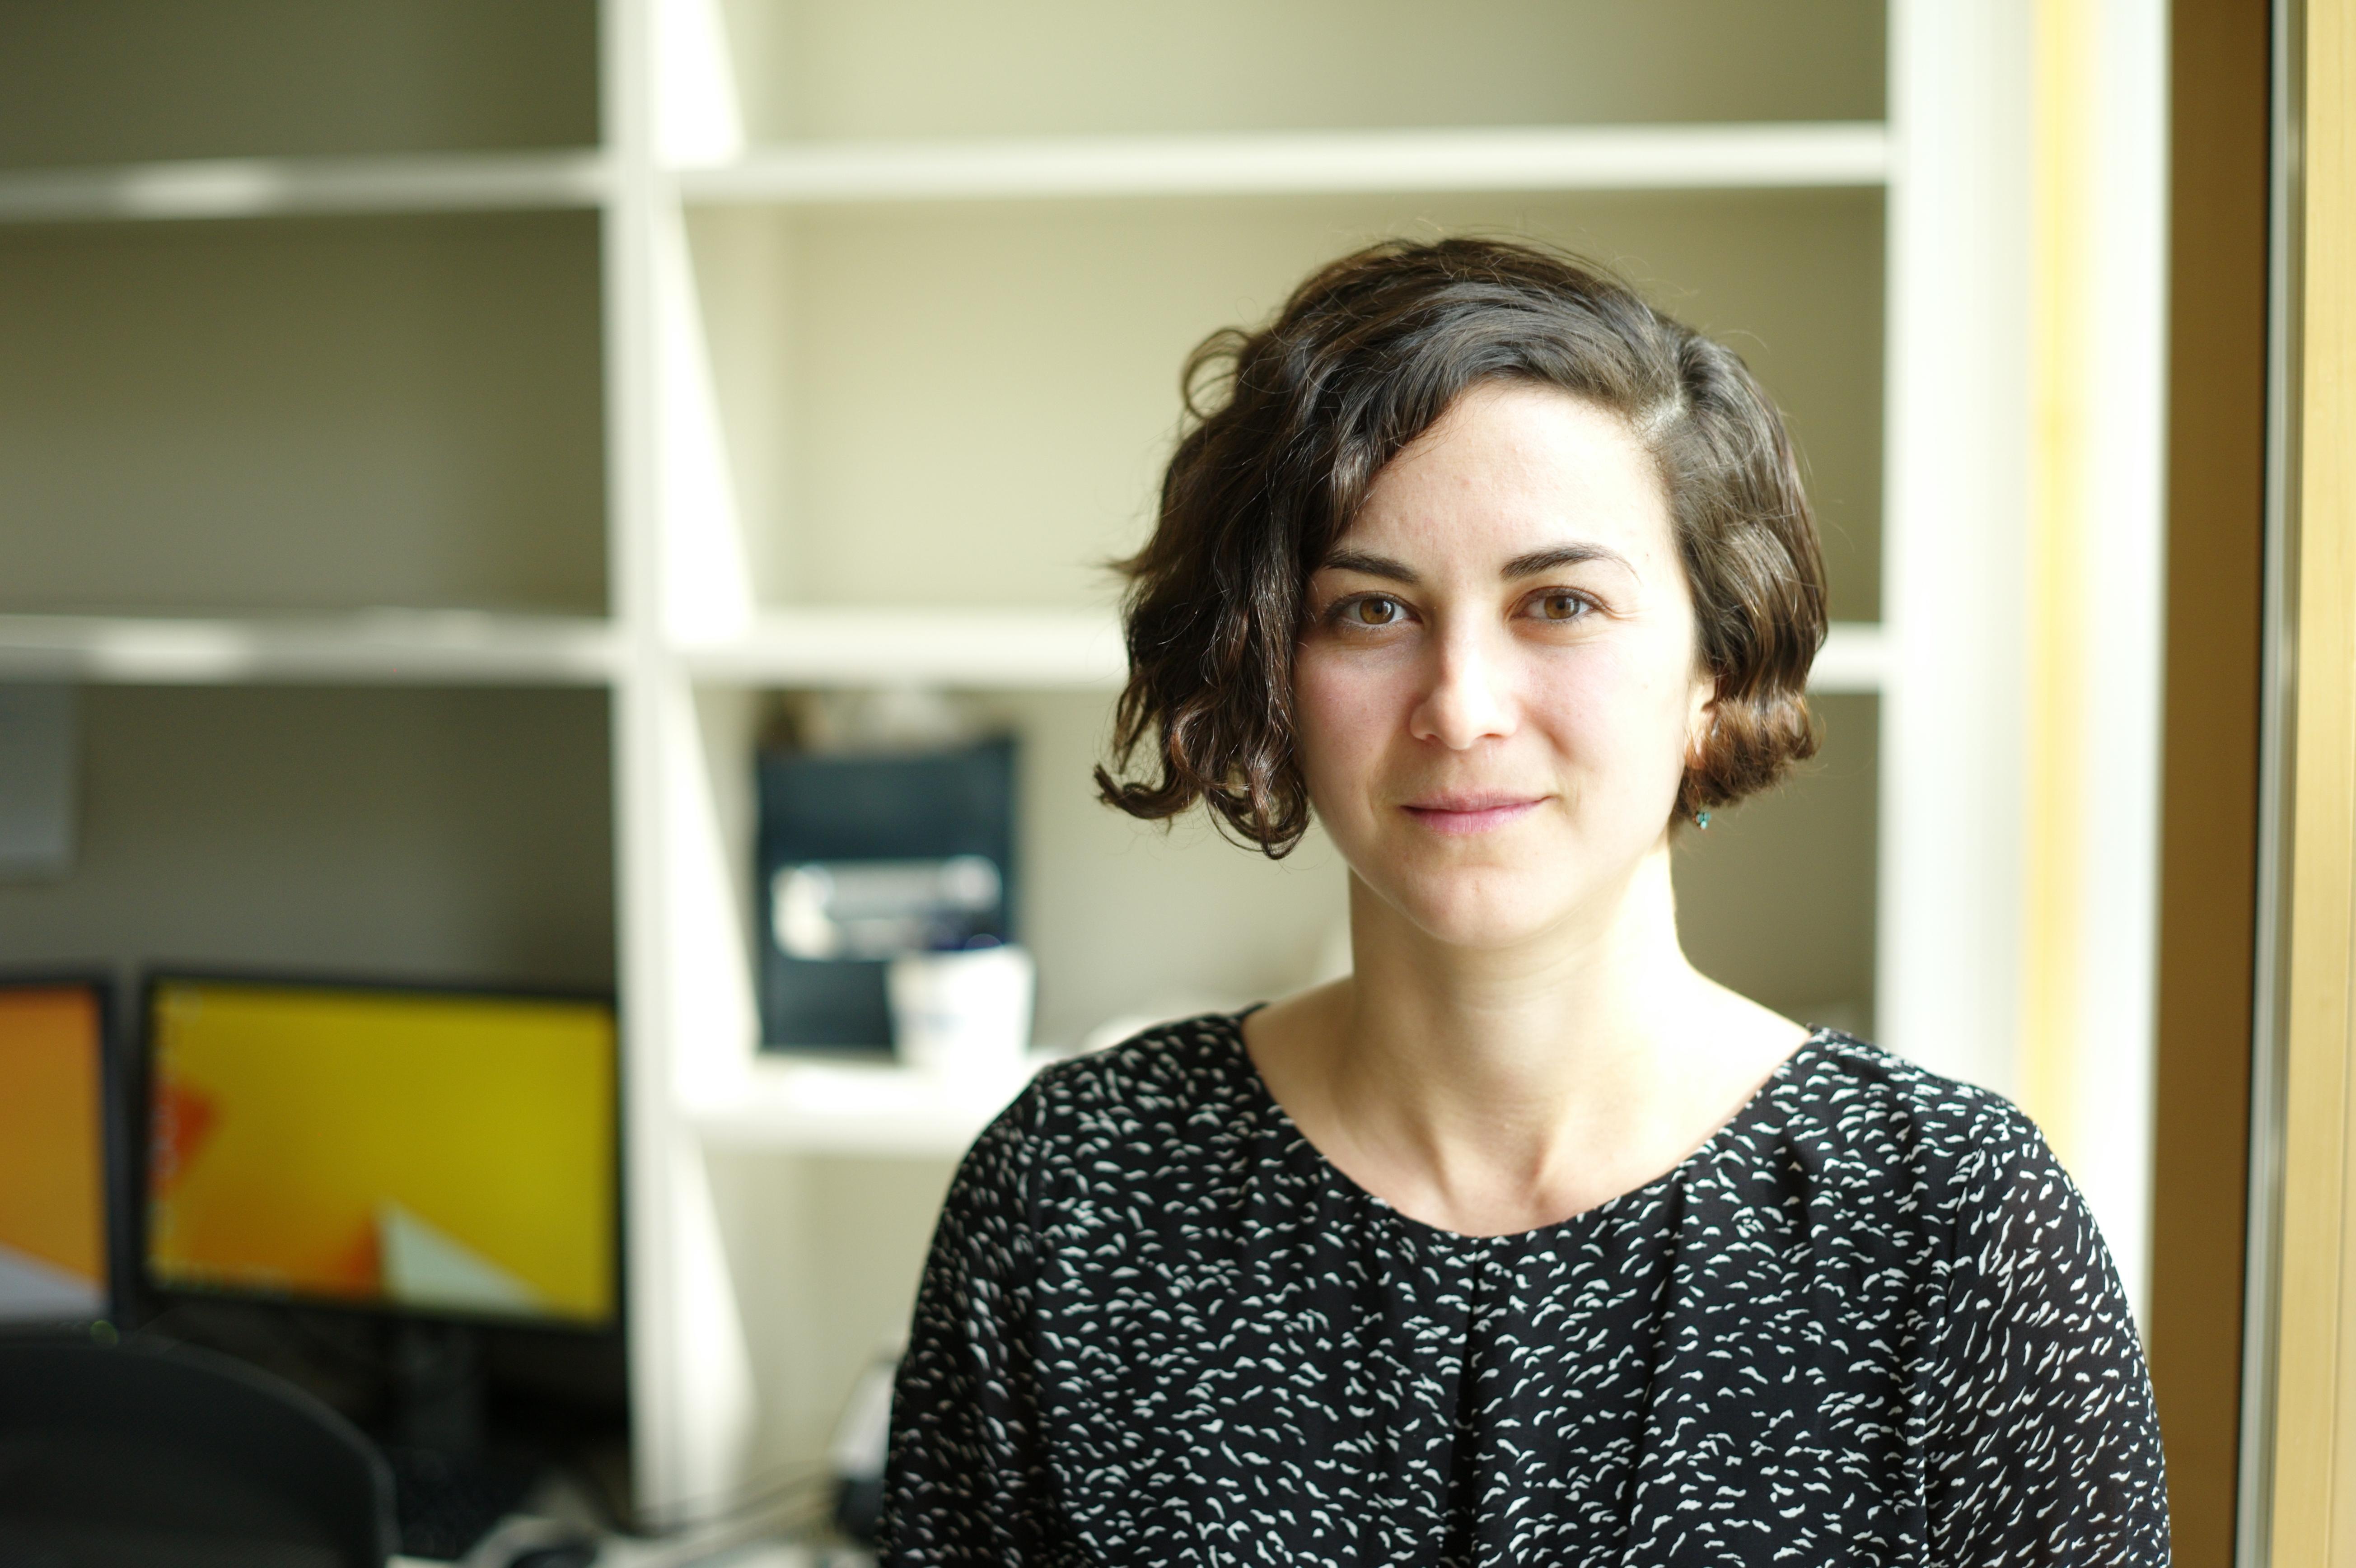 Vanessa Schipani